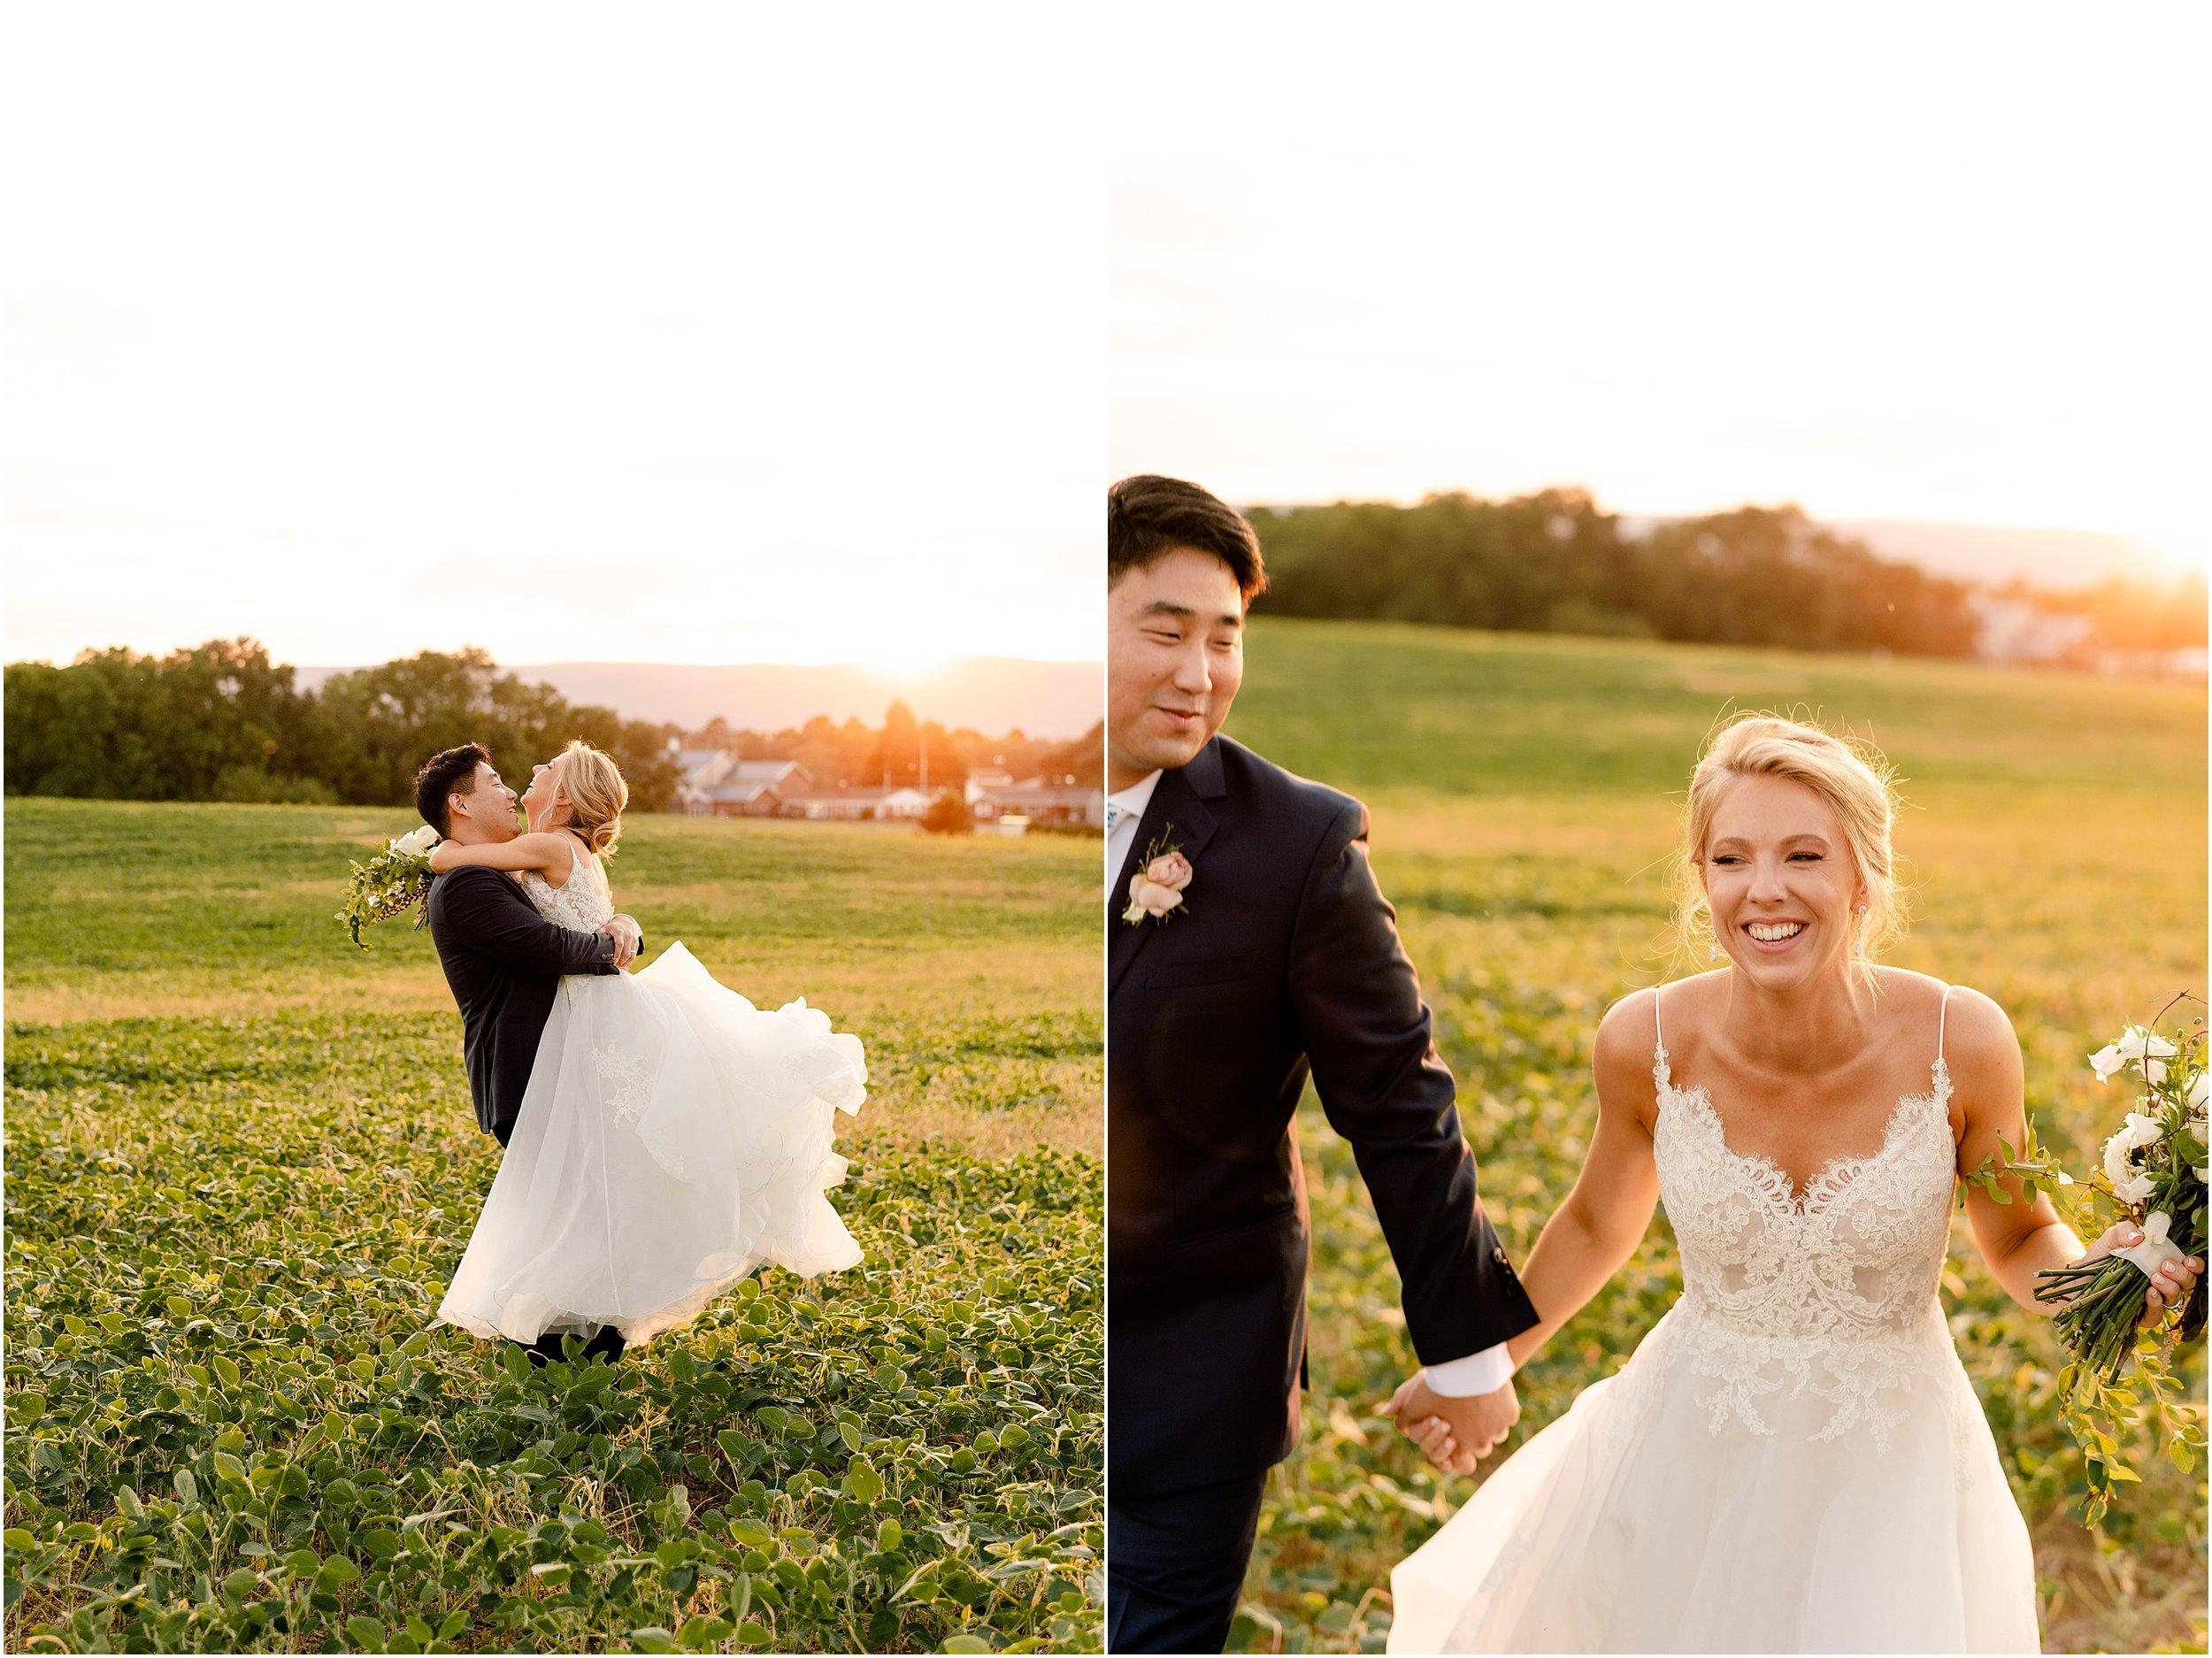 hannah leigh photography Walkers Overlook Wedding Walkersville MD_3549.jpg